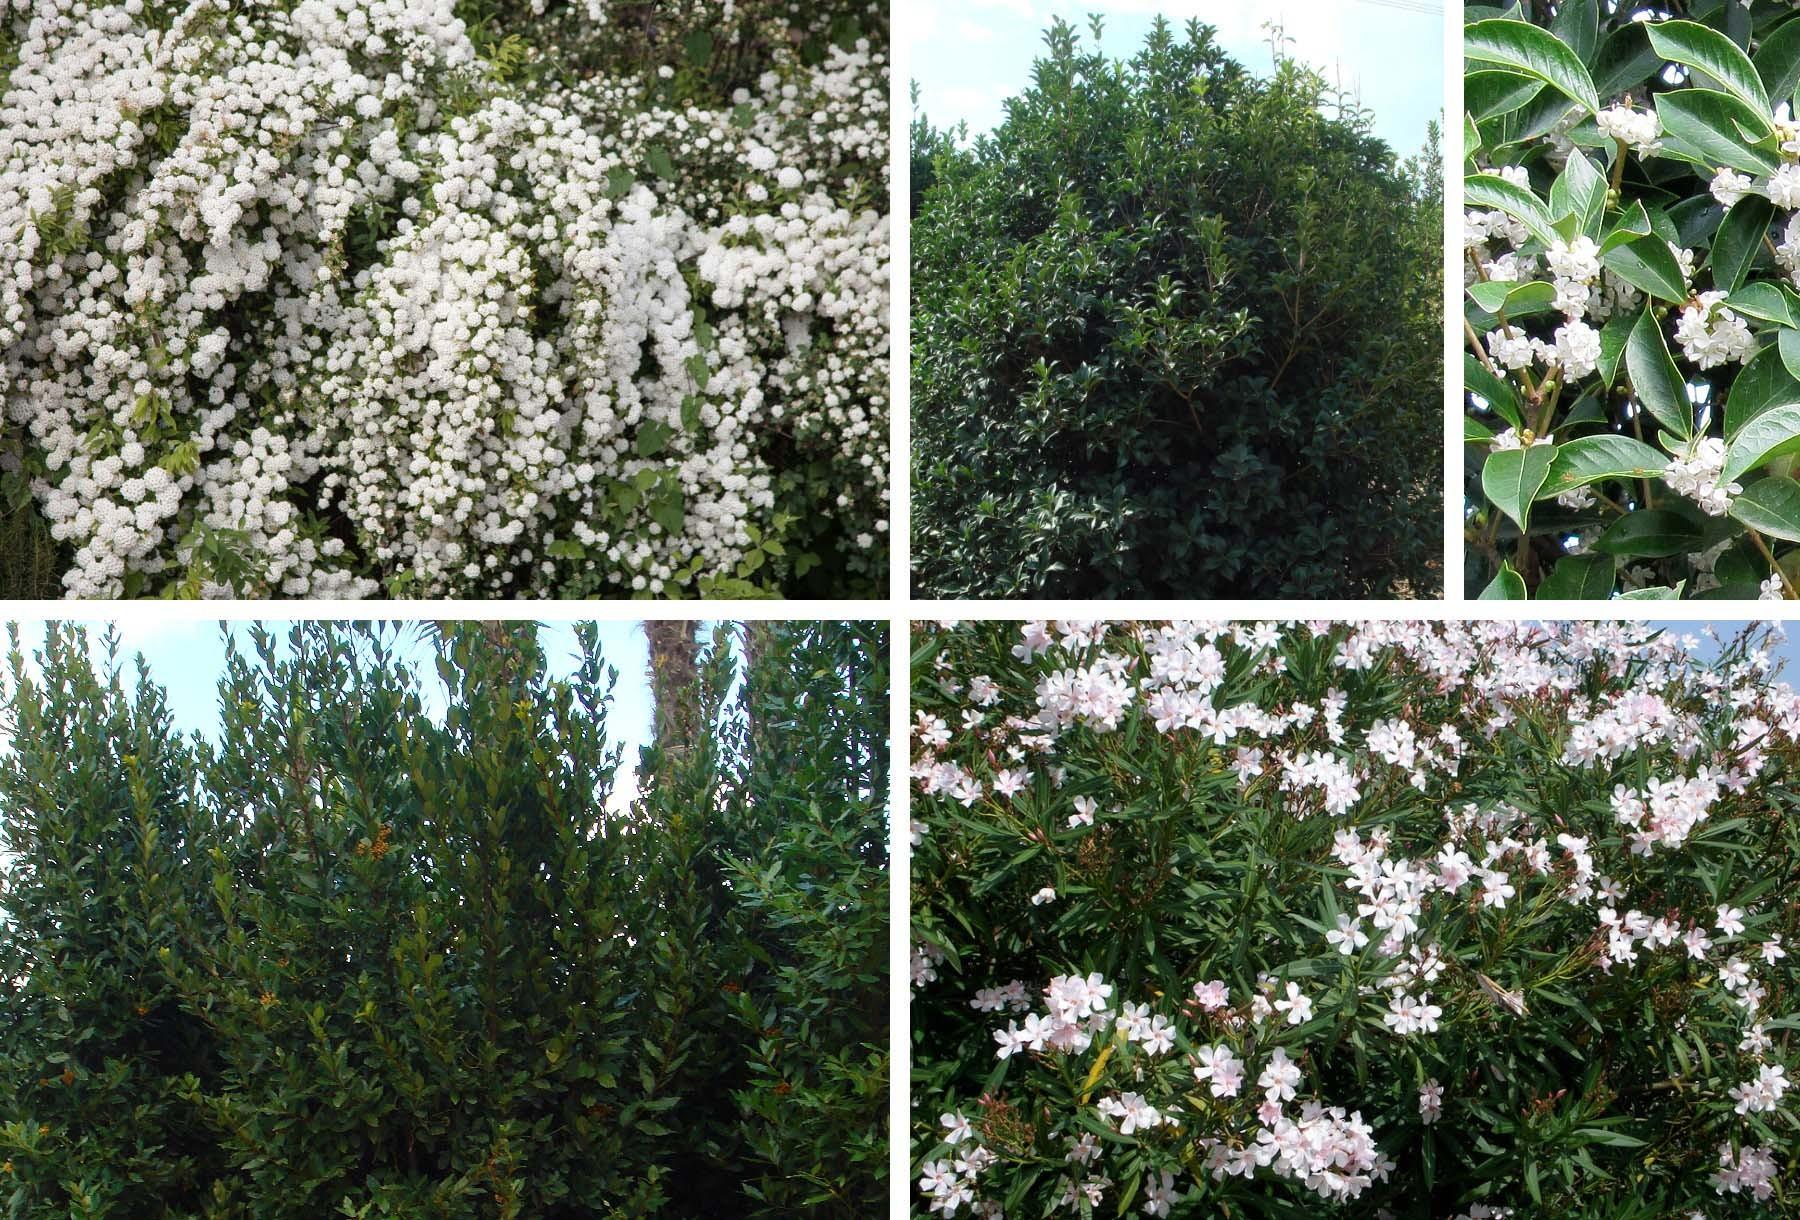 Un giardino sospeso - Terrazze